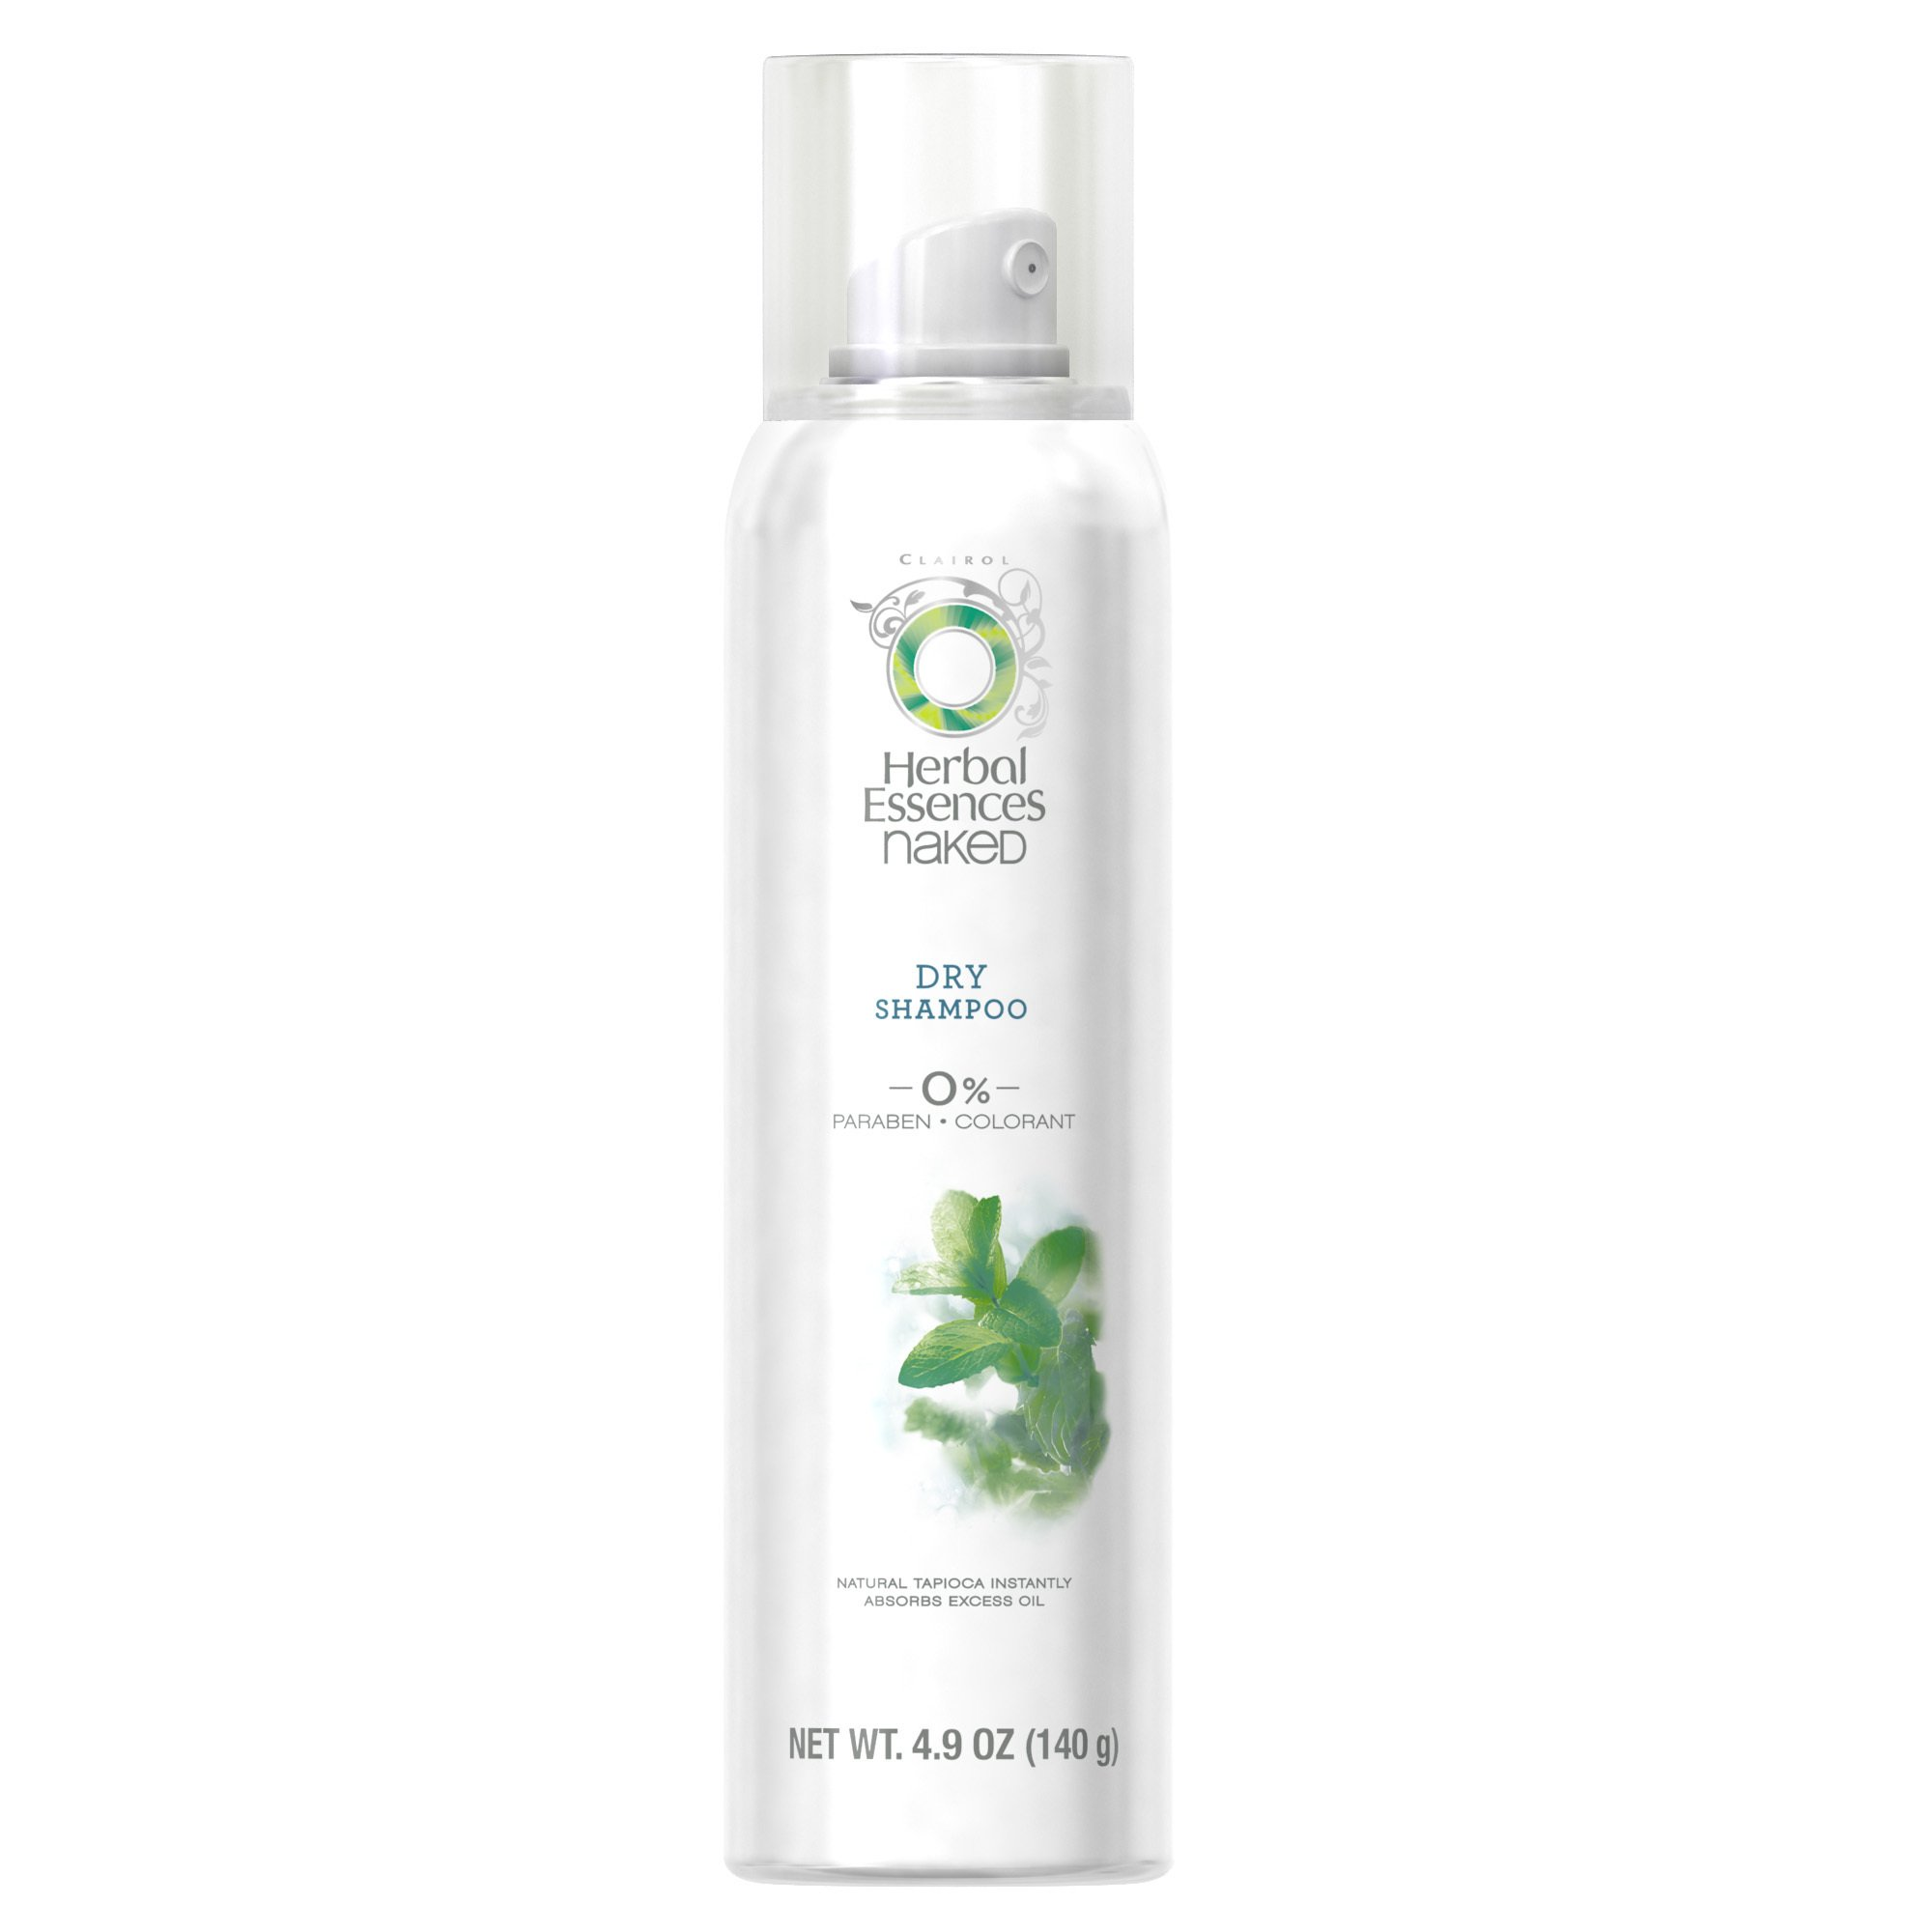 Herbal essences naked dry shampoo photo 61